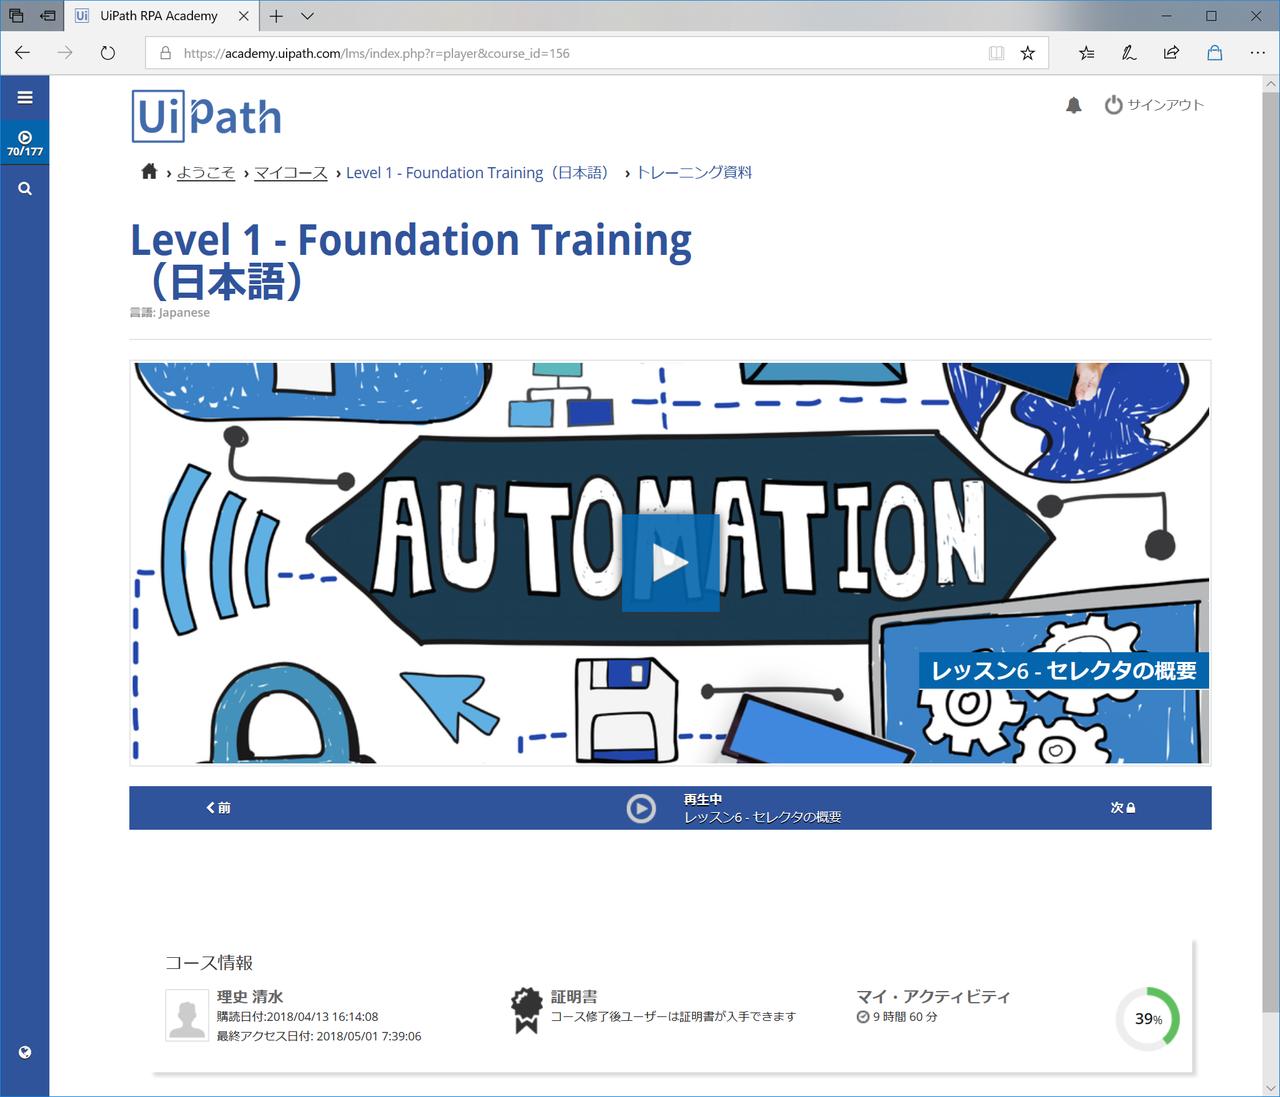 UiPathの基本的な使い方を動画で学べるUiPath Accademy